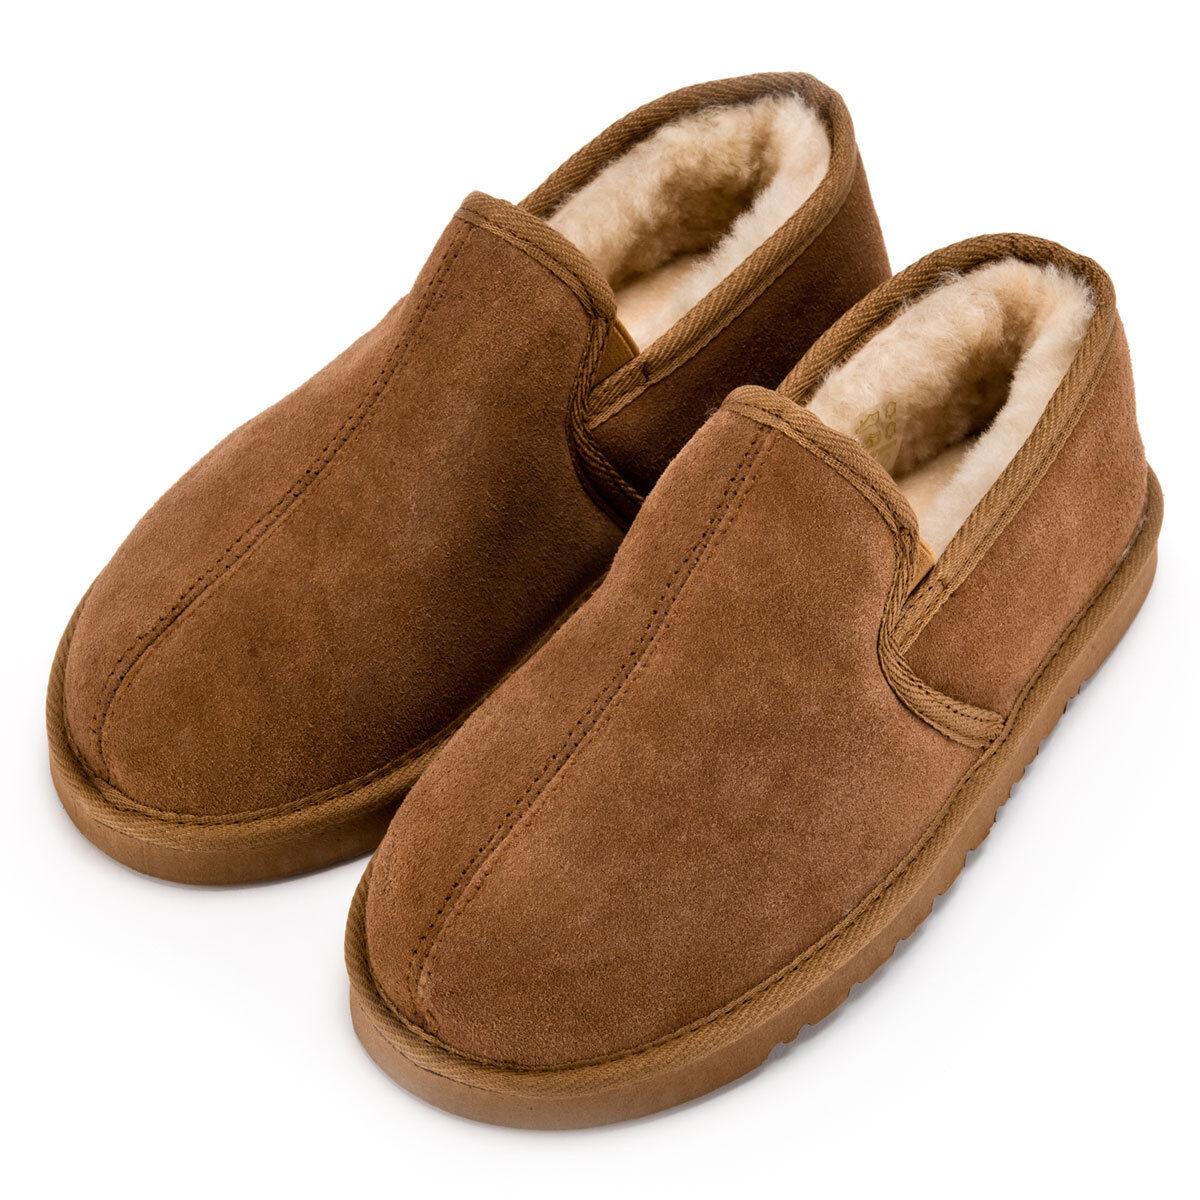 Herren Soft Sole Chestnut Sheepskin Slipper Boot  - British  Boot Herren Sheepskin Slippers aa4d33